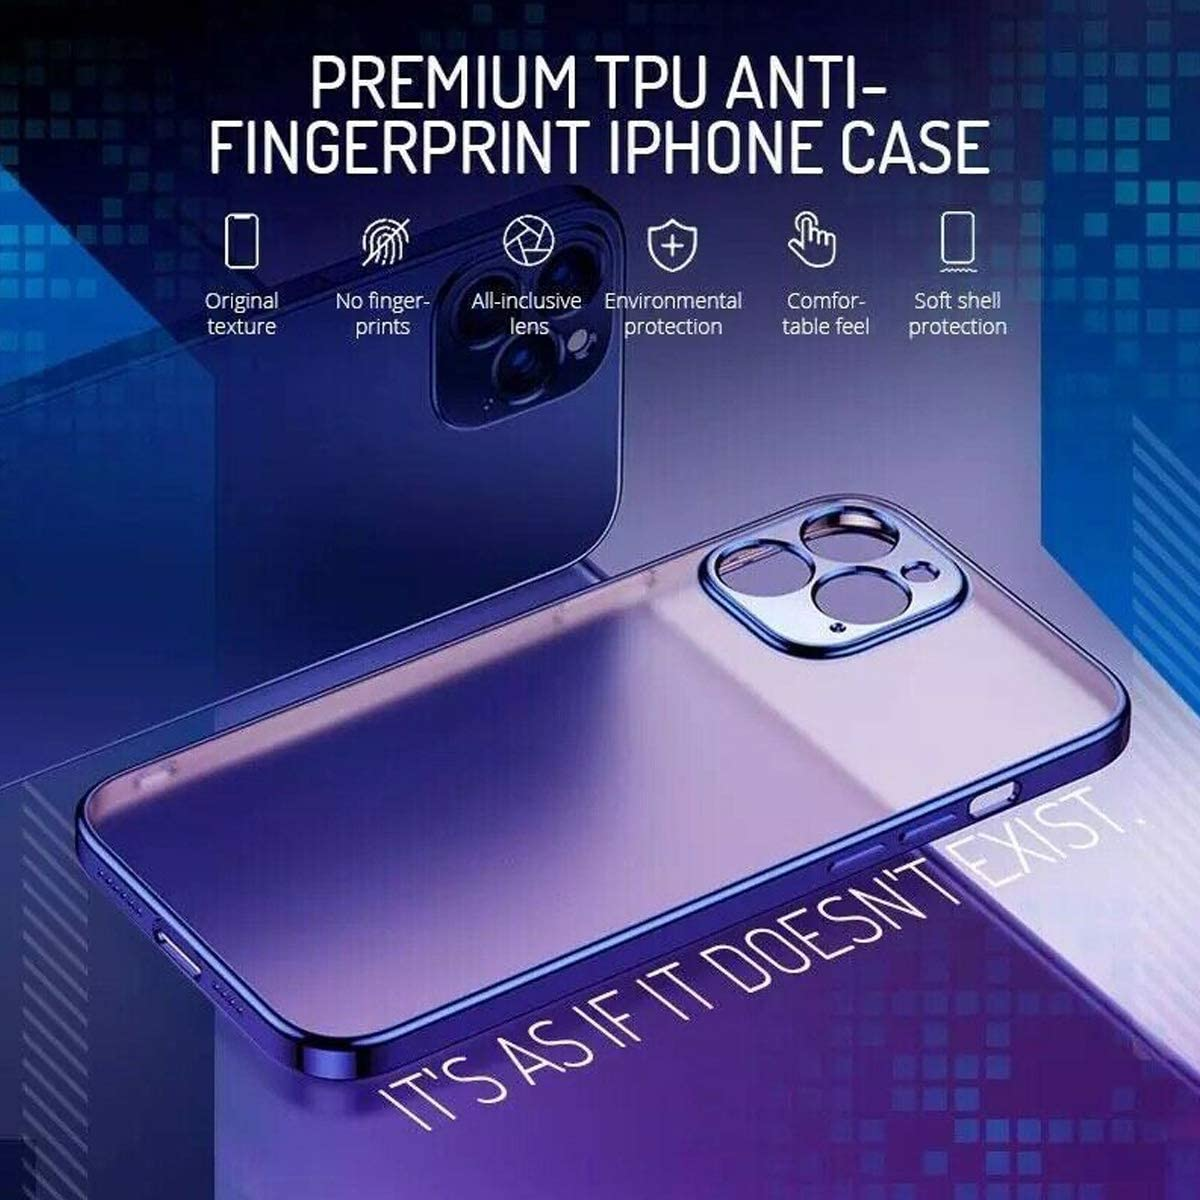 Anti-Scratch Reinforced Corner /& Bumper Shockproof Drop Protection Soft Phone Case 11 Black LODIIYAR Premium TPU Anti-Fingerprint Phone Case Cover for iPhone 12 PRO Max 12 Mini 11